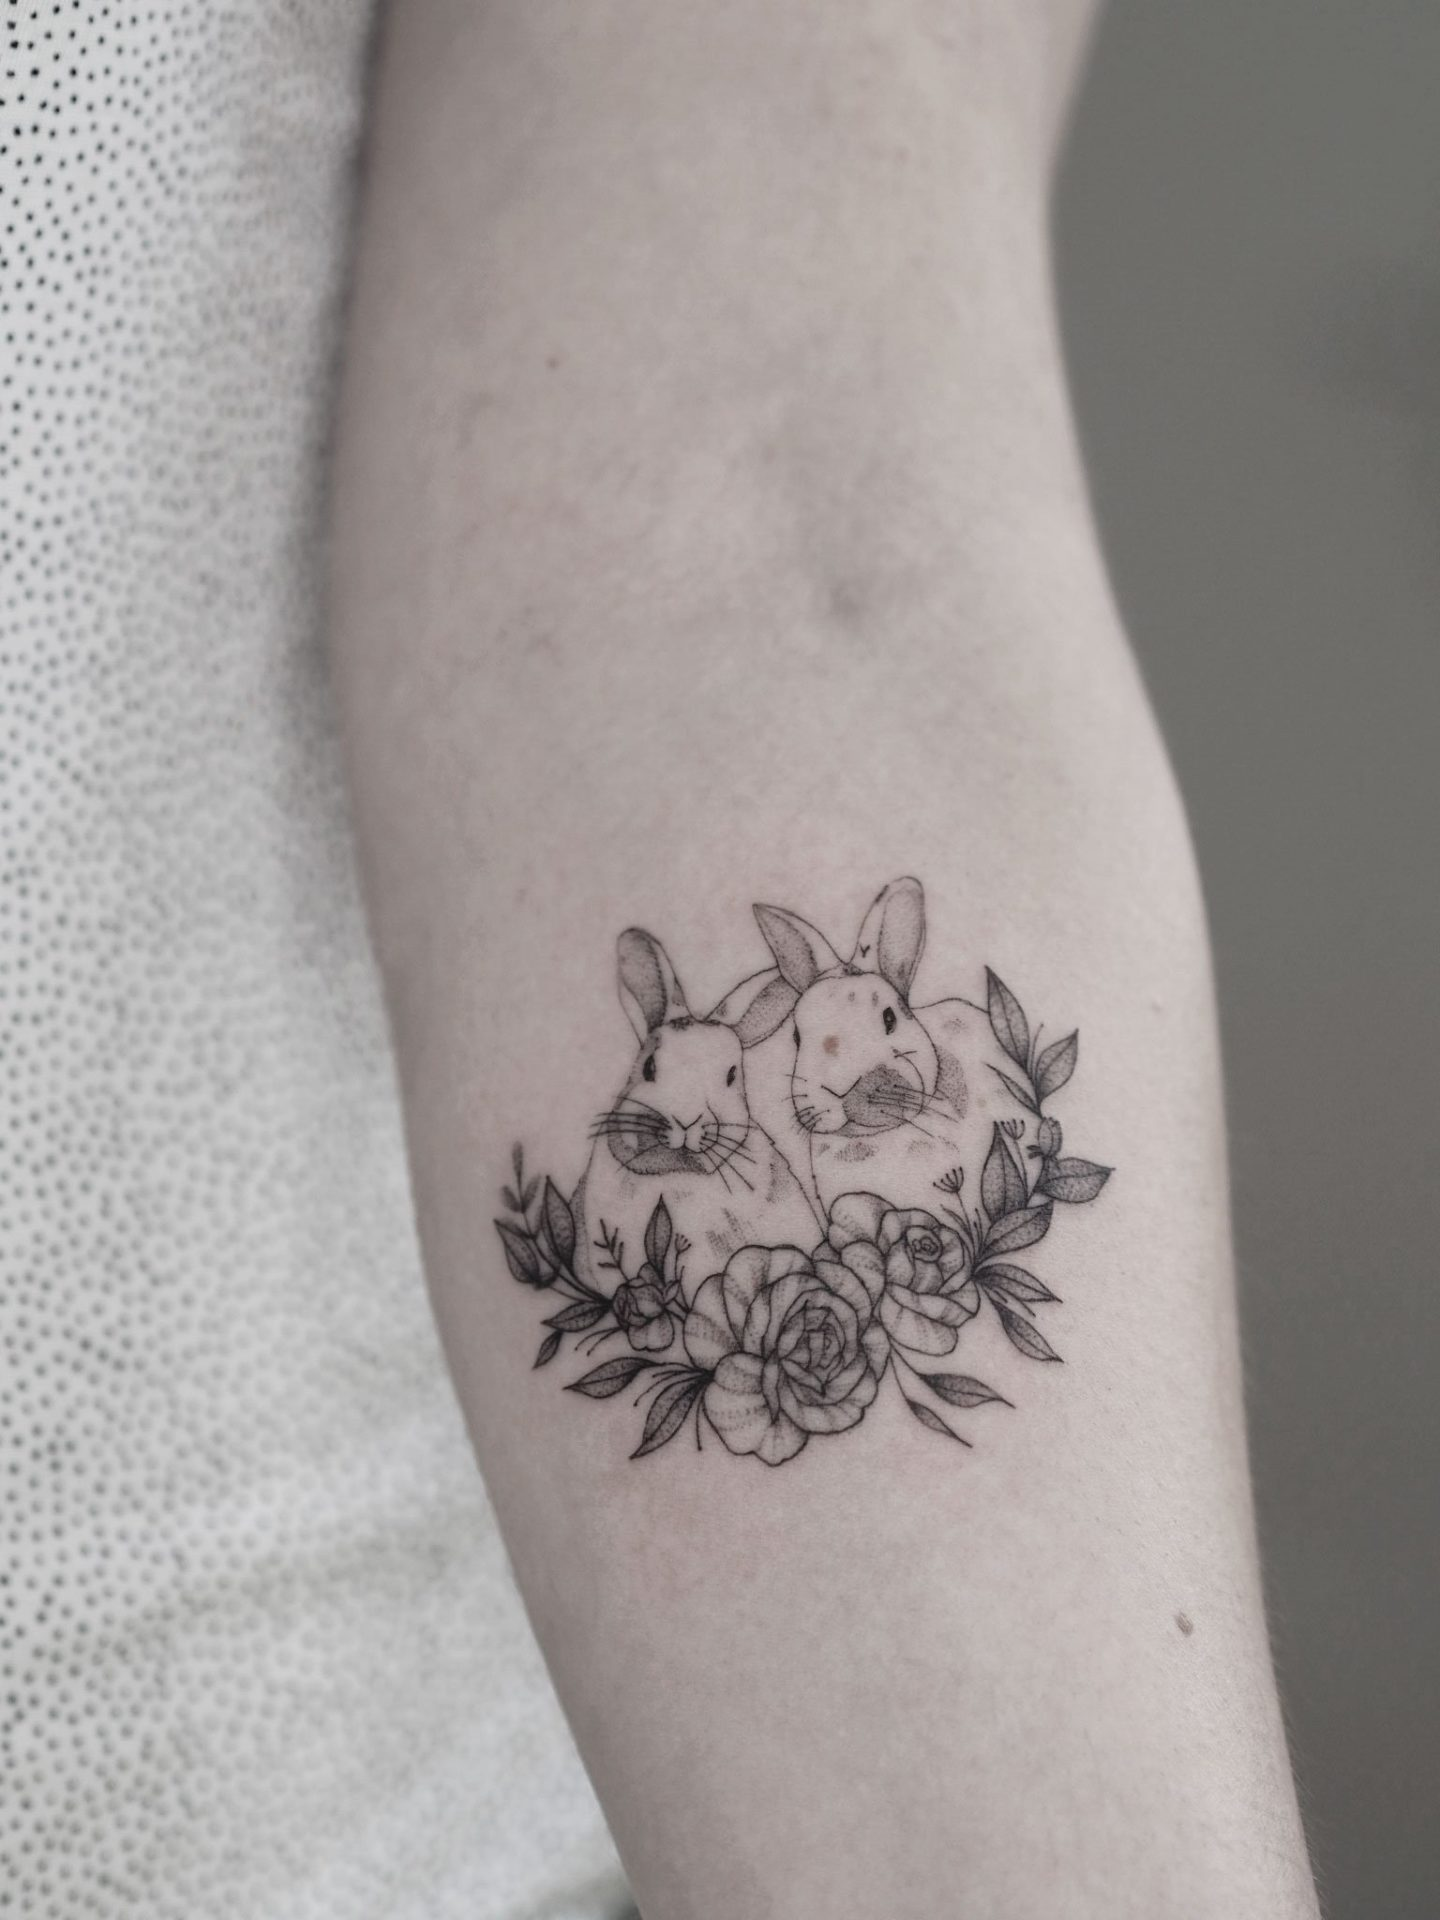 bunniesandflowers